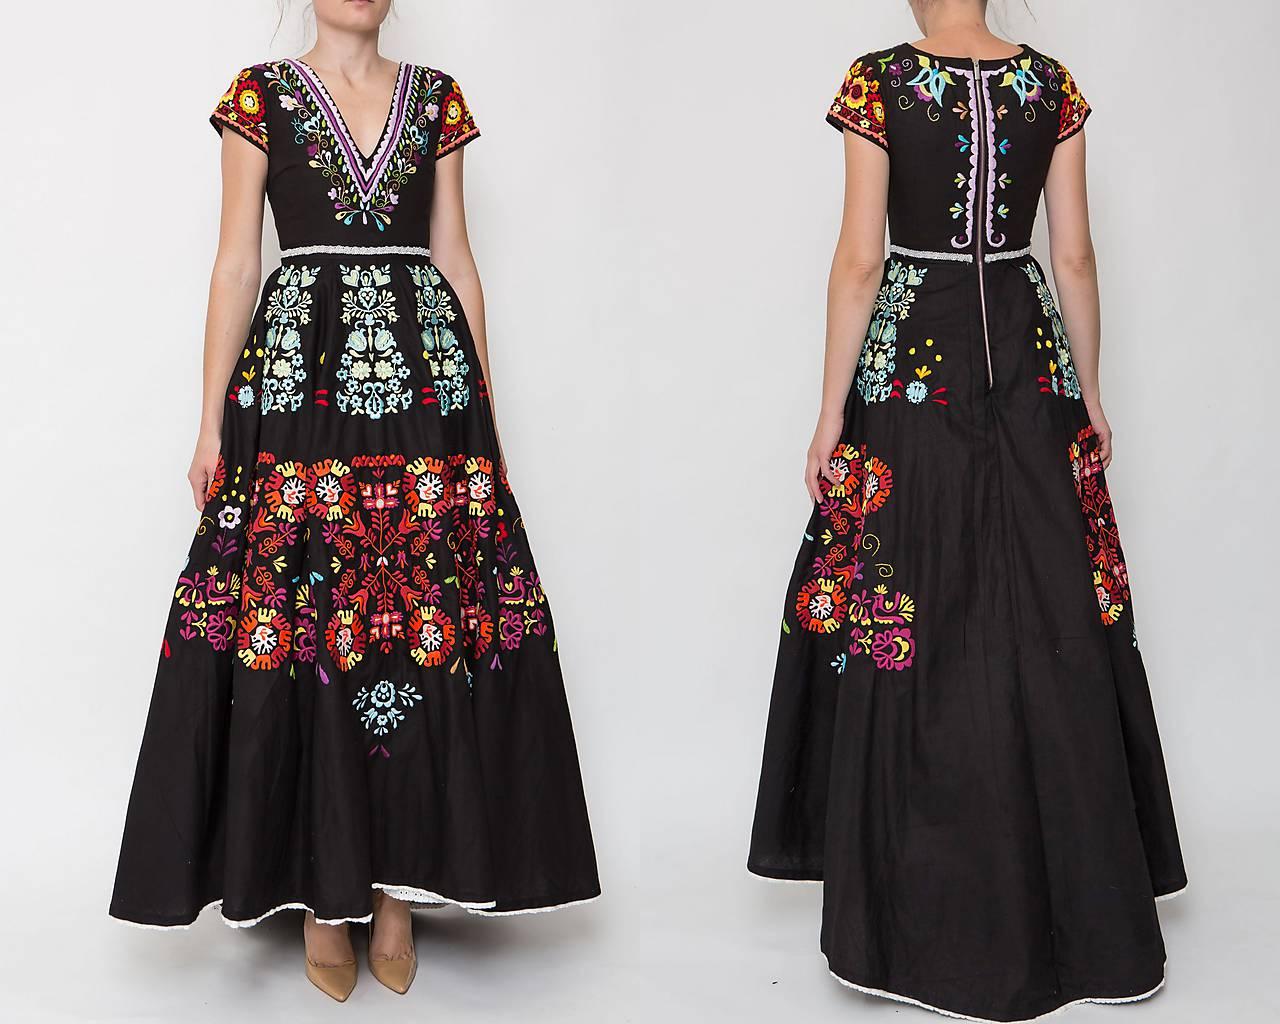 šaty Slavianka